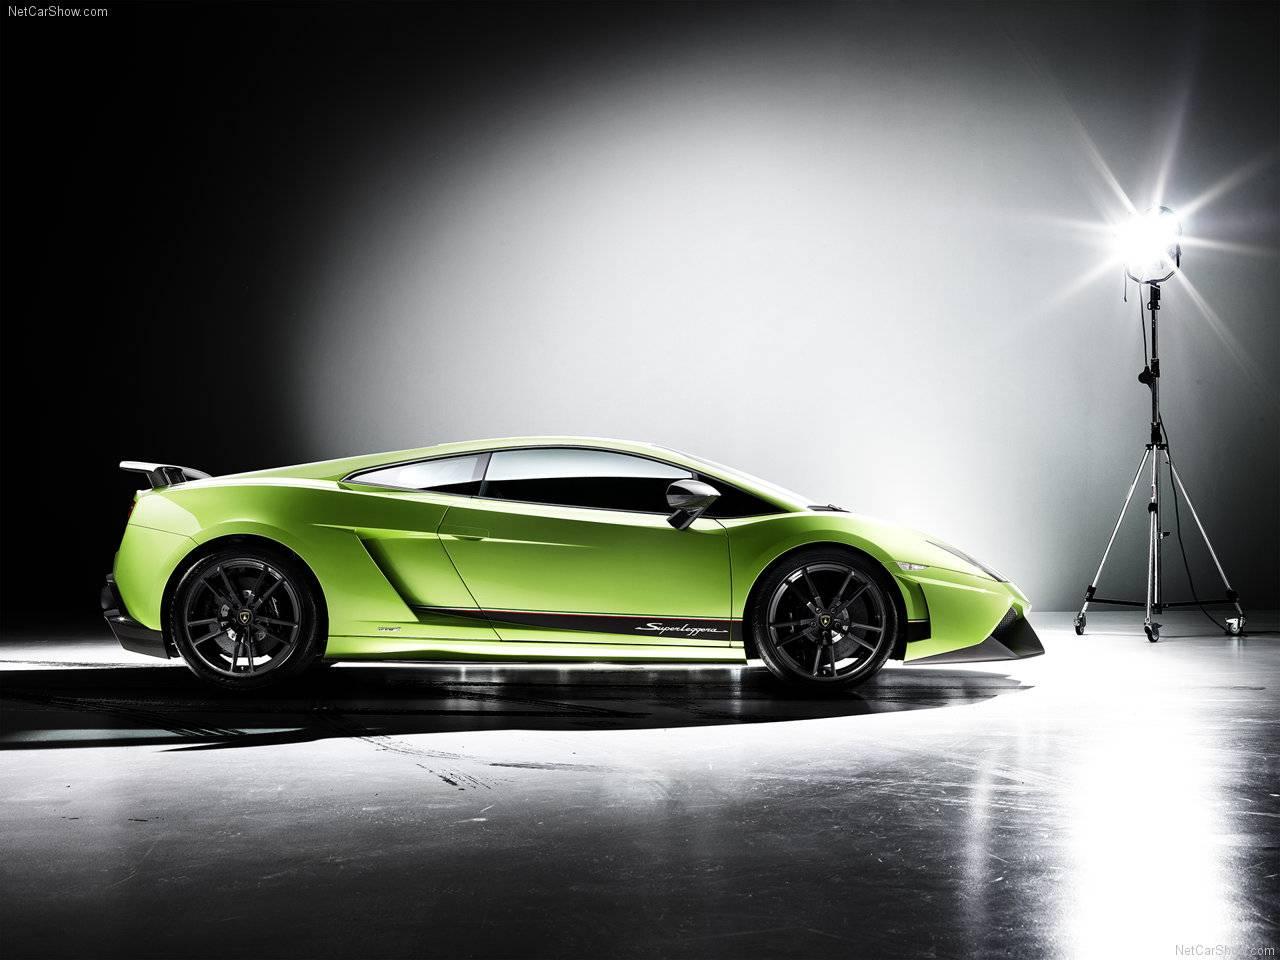 http://2.bp.blogspot.com/_lsyt_wQ2awY/TDipLvCZXaI/AAAAAAAB8_w/RYFAykXZDnU/s1600/Lamborghini-Gallardo_LP570-4_Superleggera_2011_1280x960_wallpaper_02.jpg